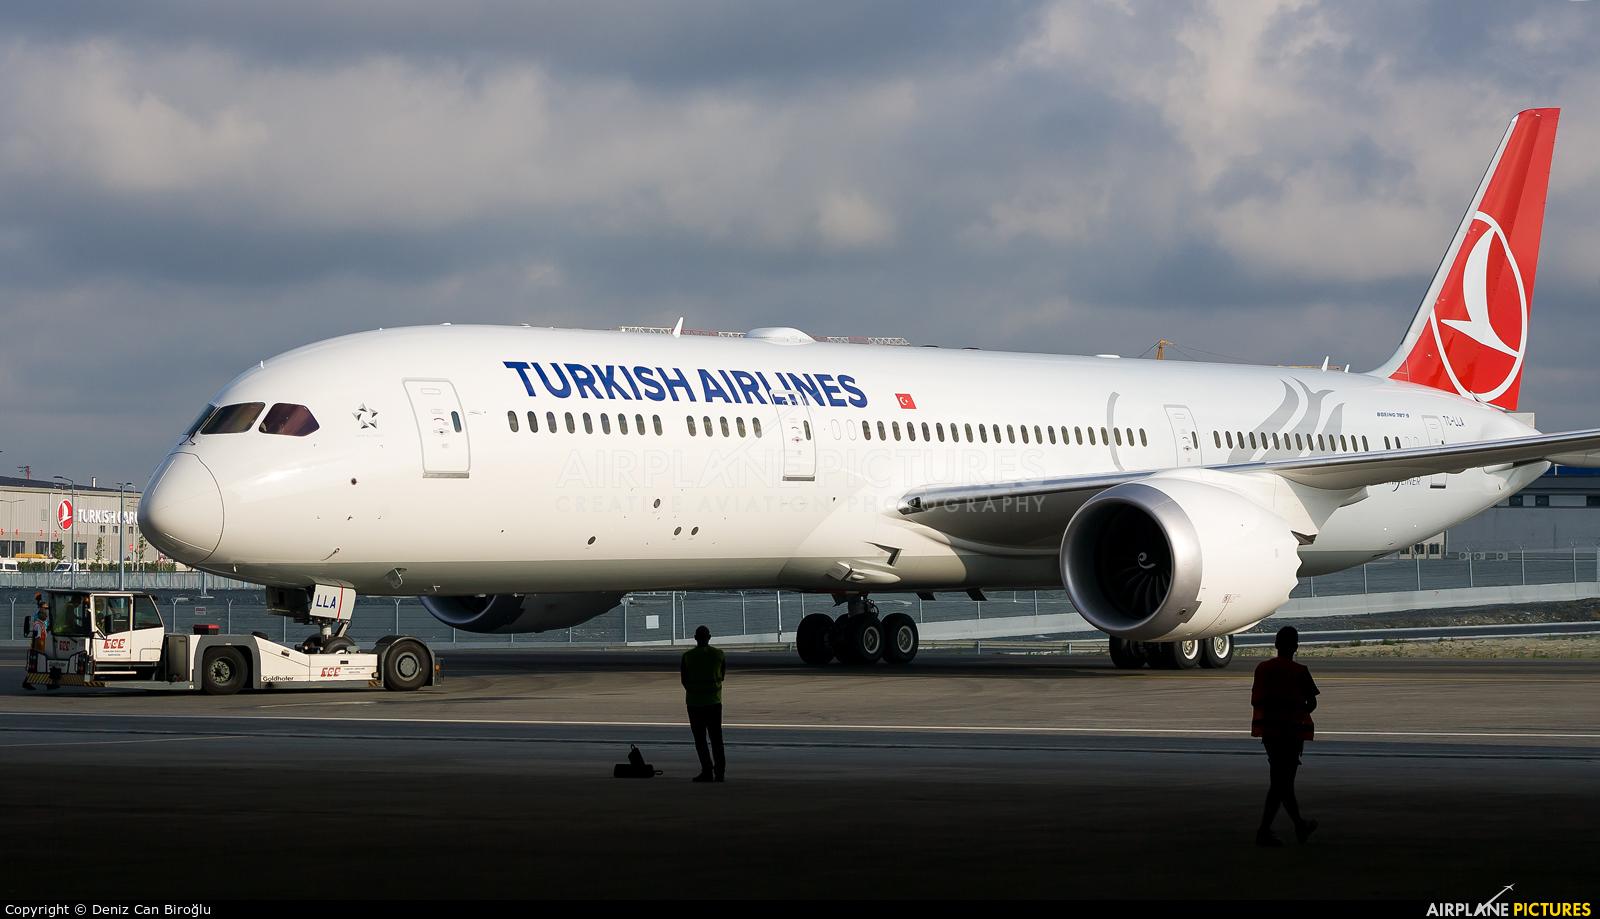 Turkish Airlines TC-LLA aircraft at İstanbul New Airport